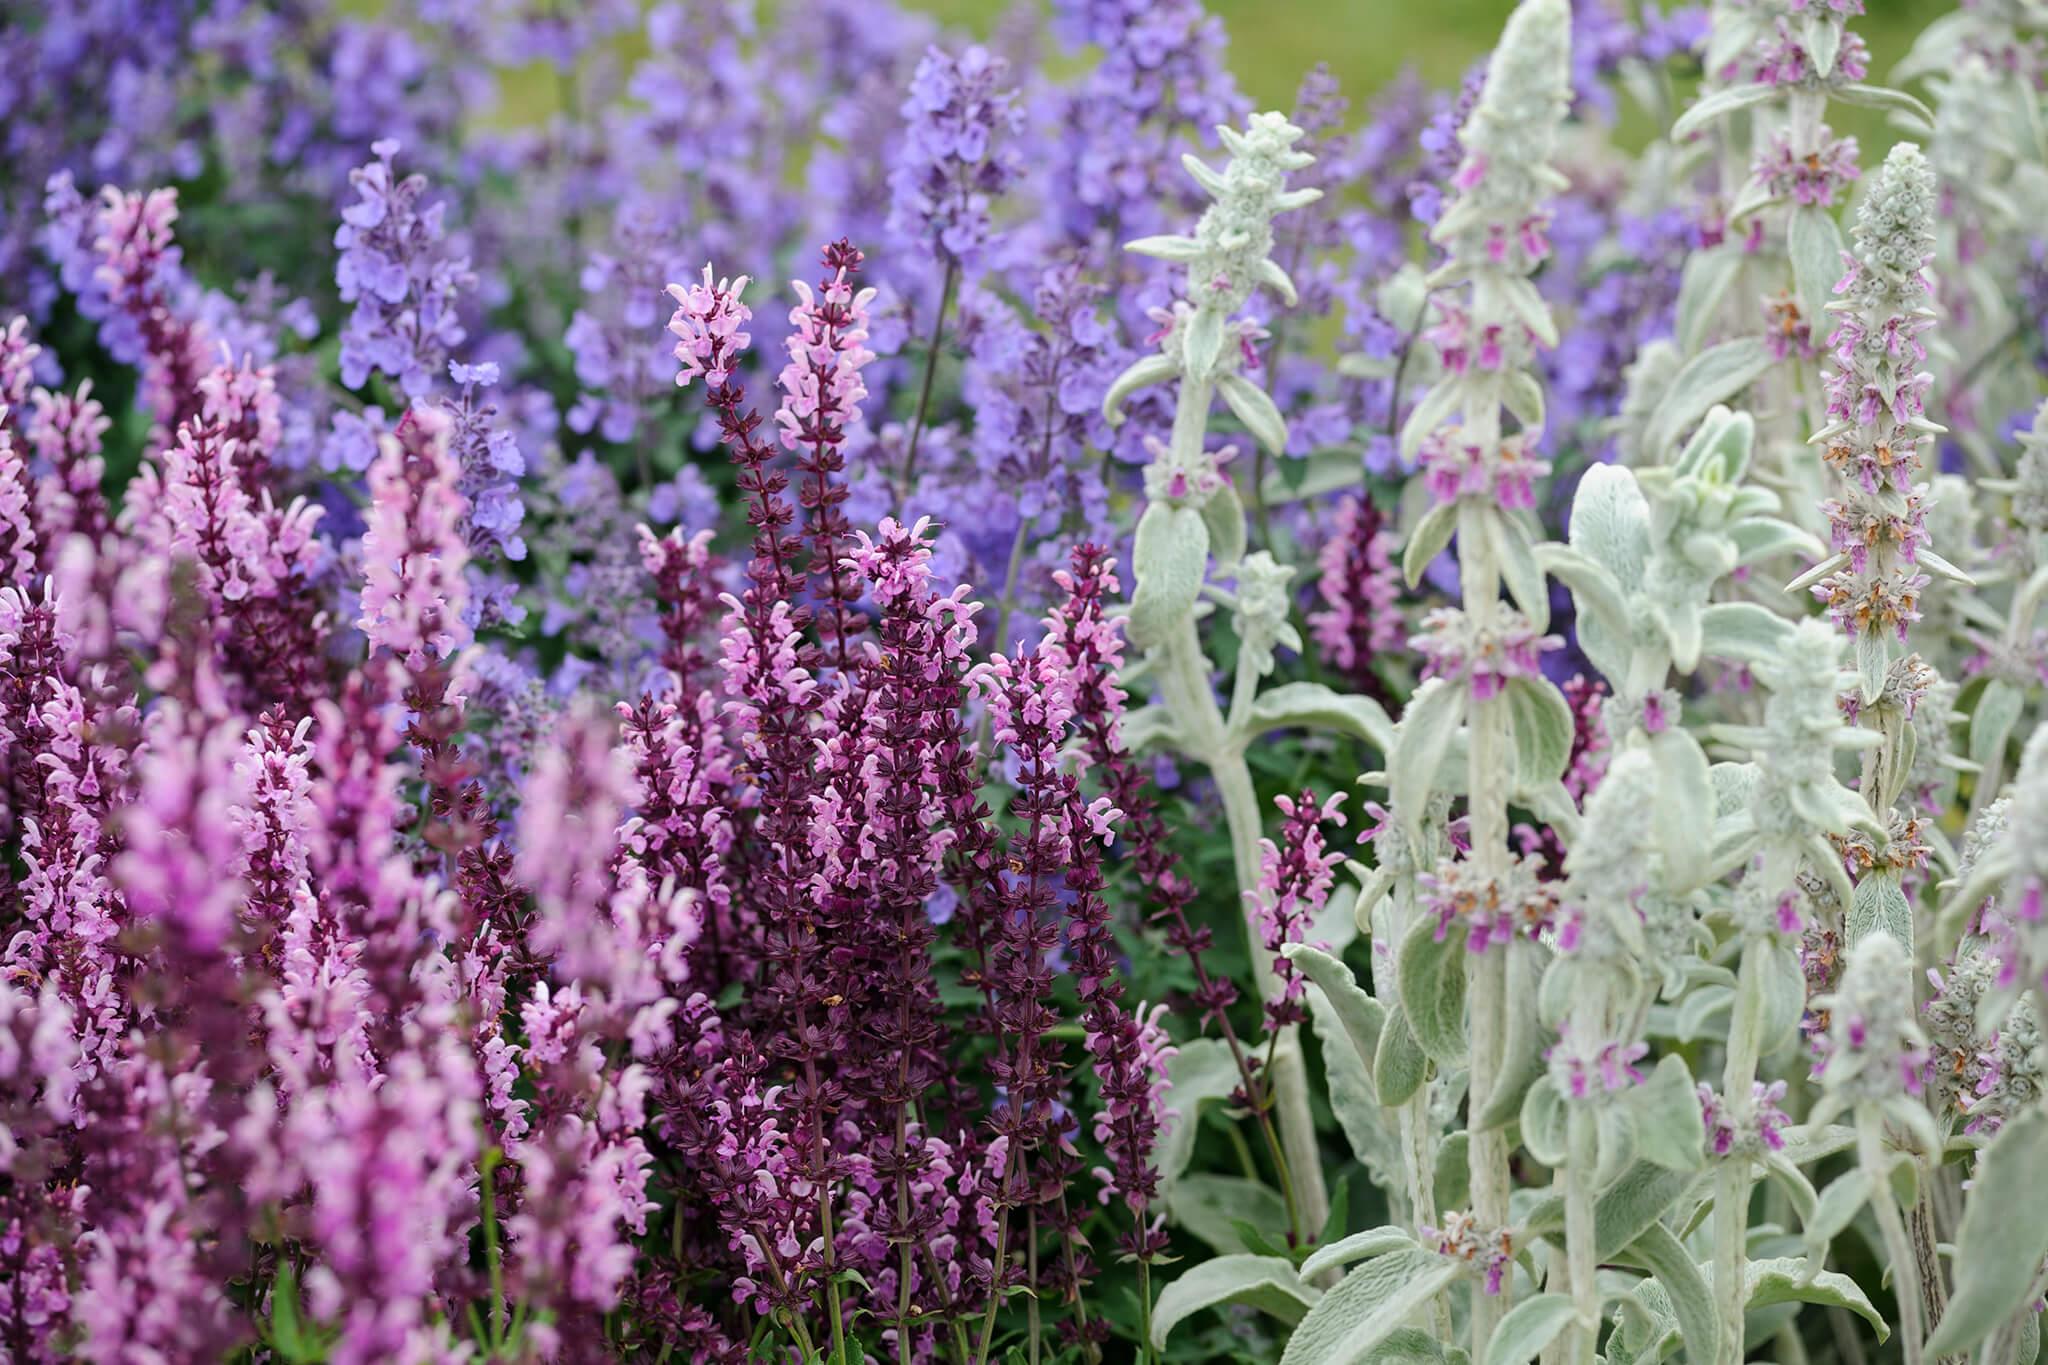 Salvia and stachys